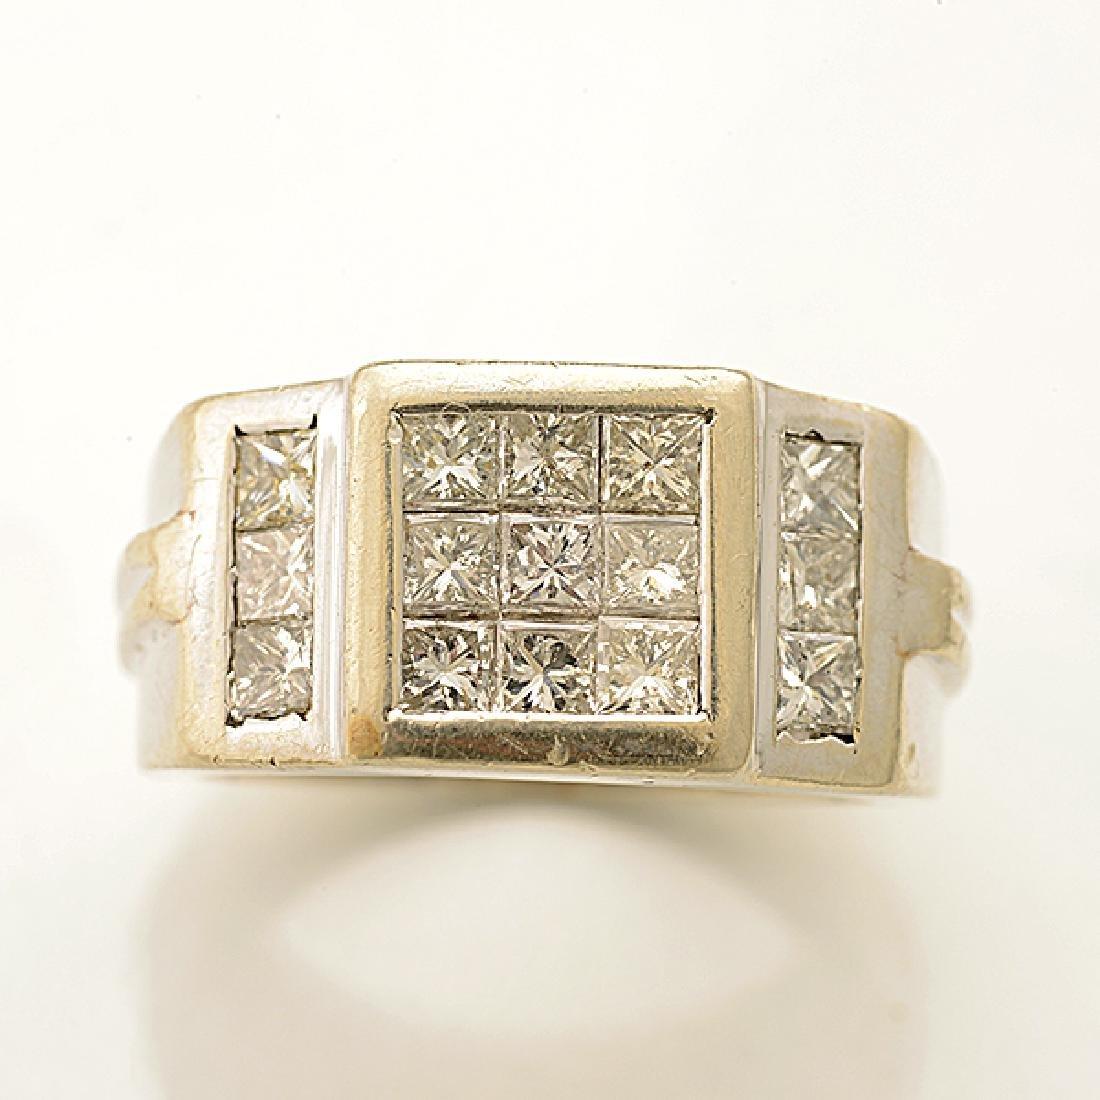 Diamond, 14k White Gold Ring. - 2